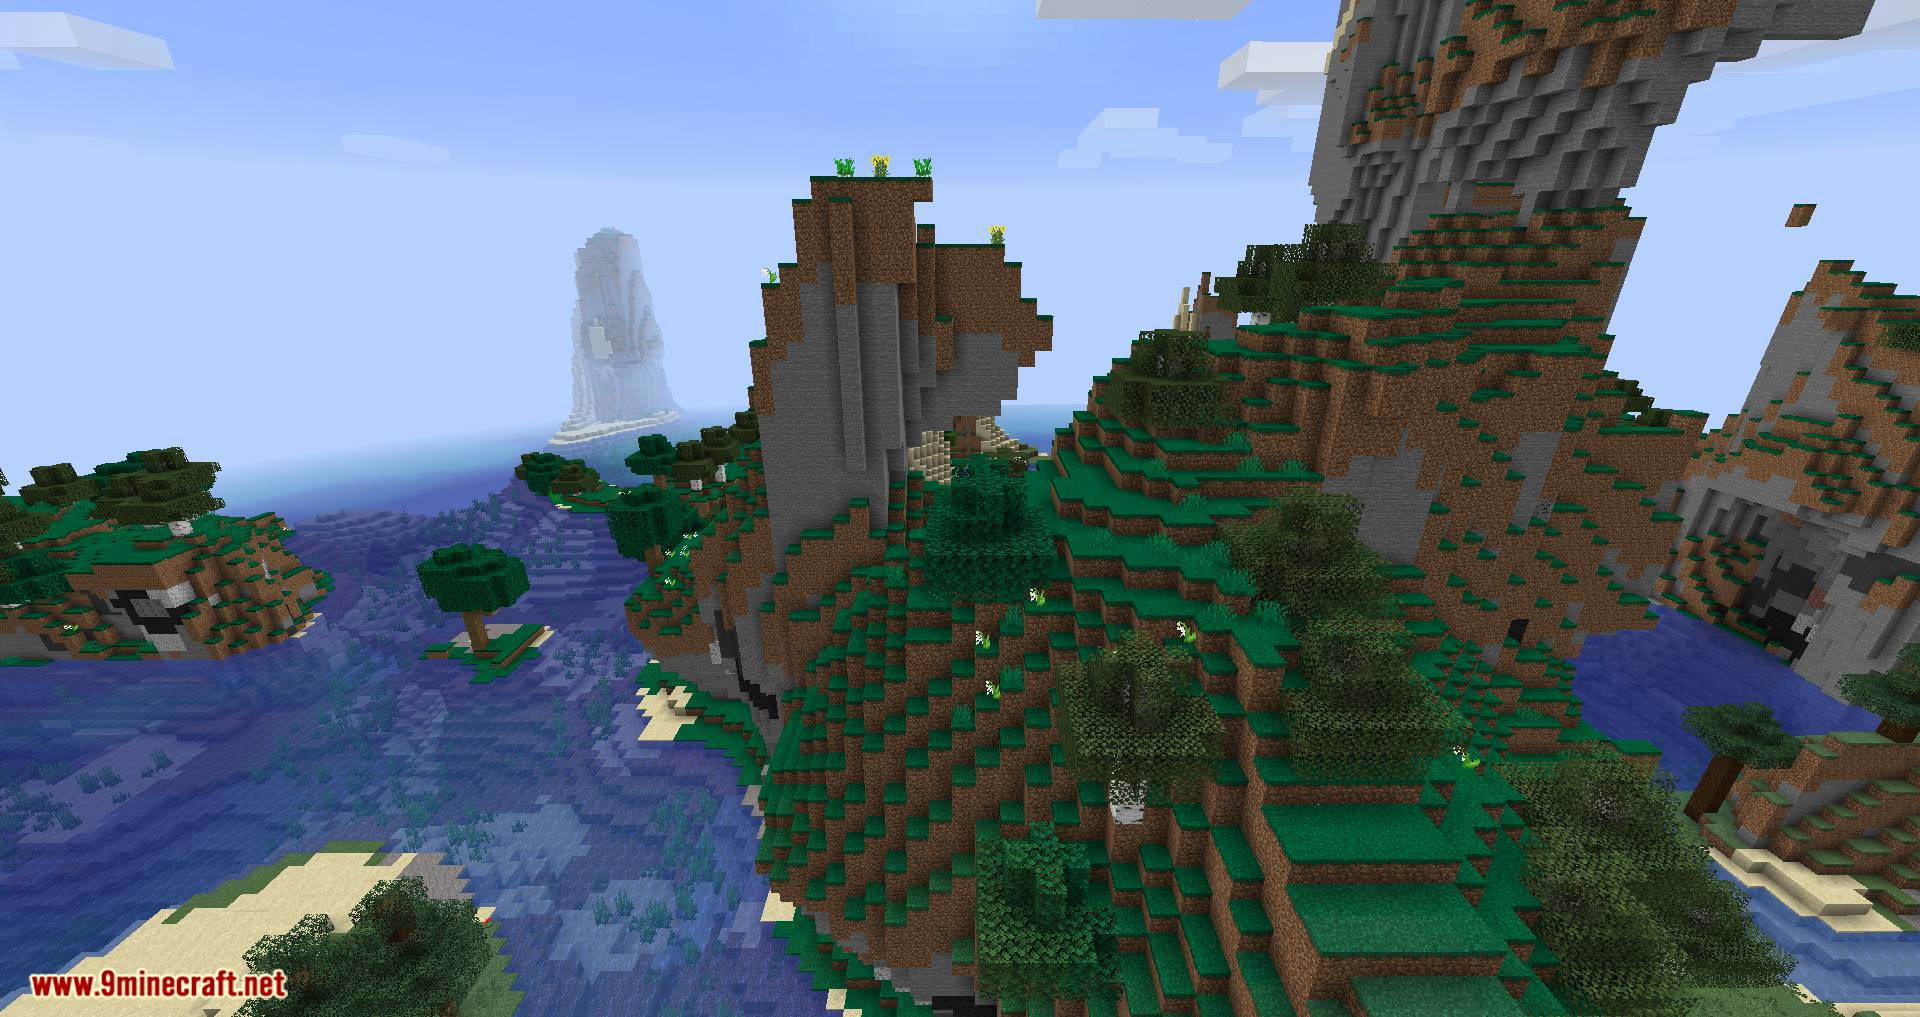 Explorercraft mod for minecraft 06